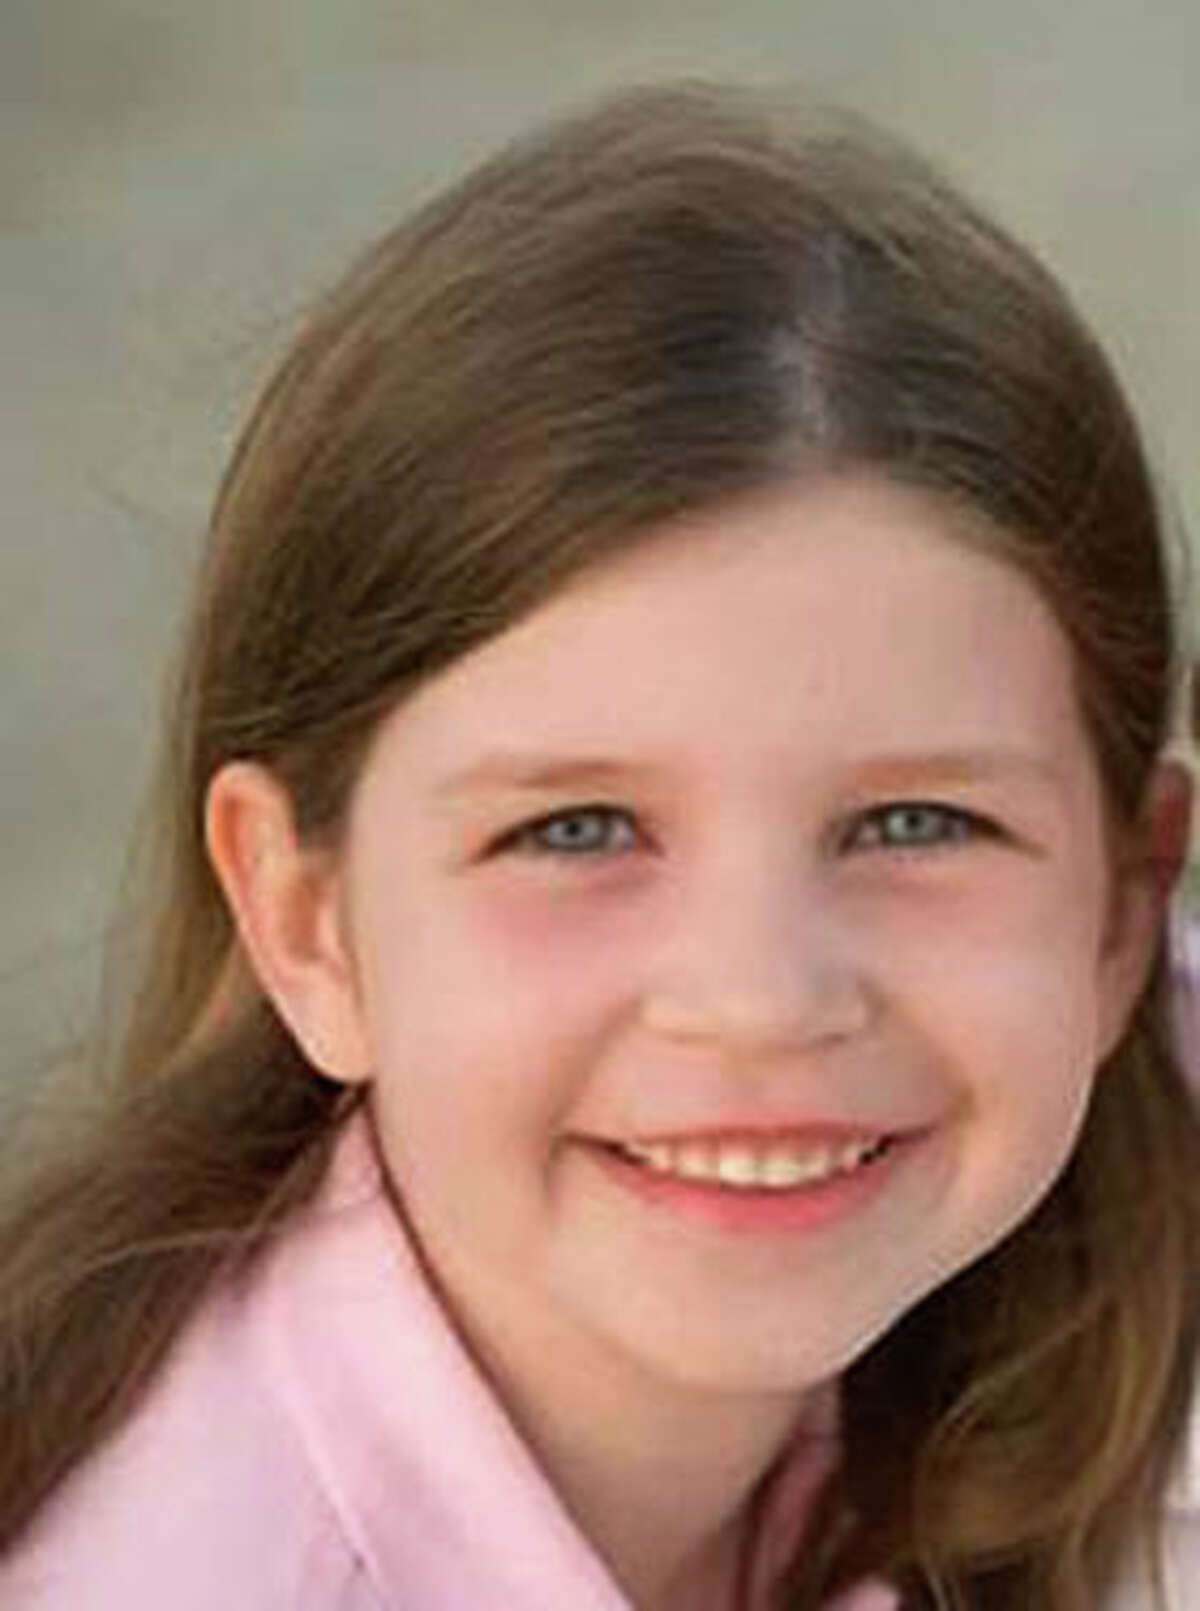 Jessica Rekos died in the Sandy Hook Elementary School shooting in Newtown, Conn. on Friday, Dec. 14, 2012.